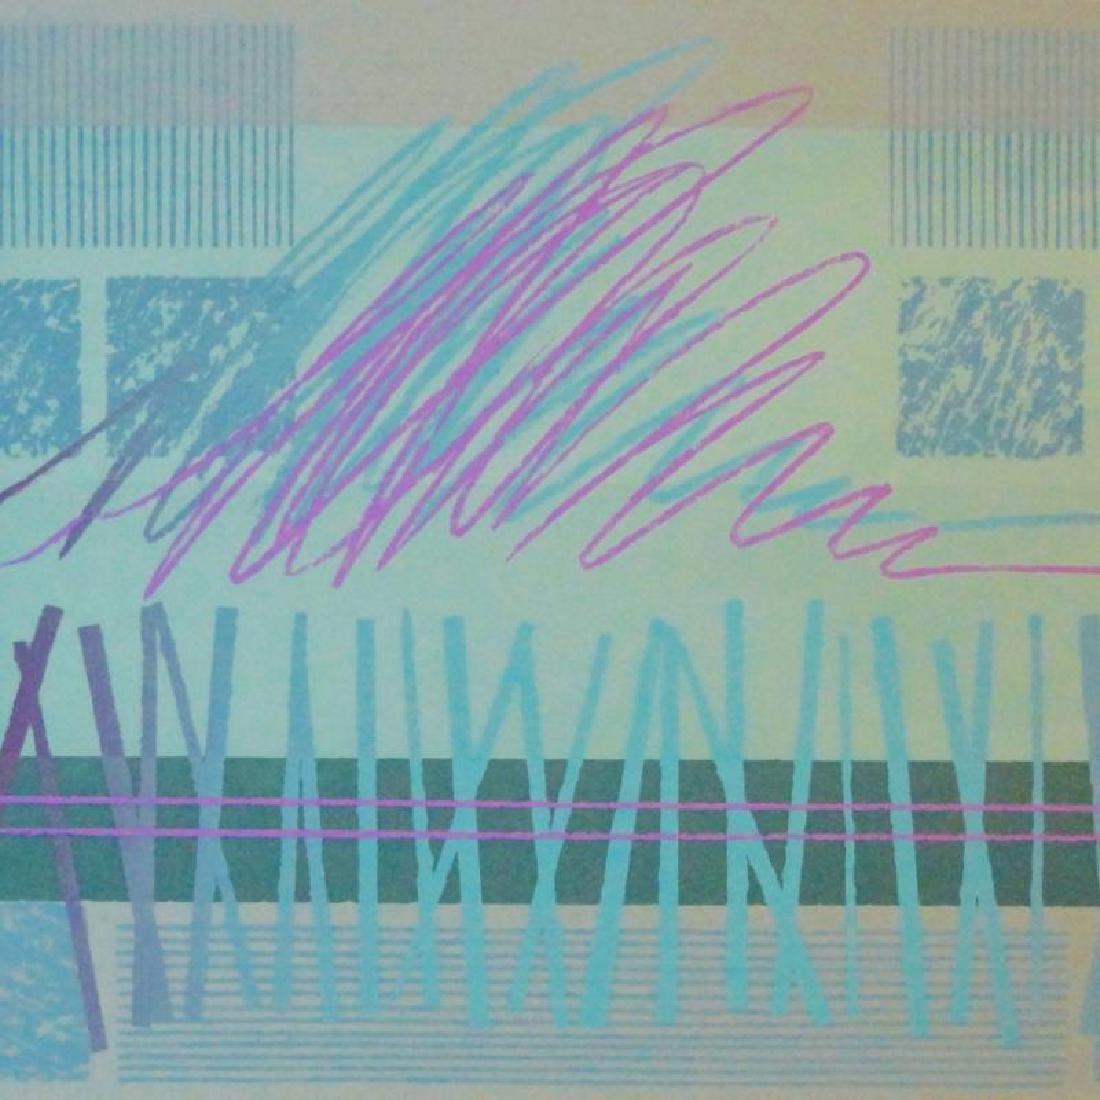 Abstract Modern Ltd Ed Signed Serigraph Huge Sale - 3